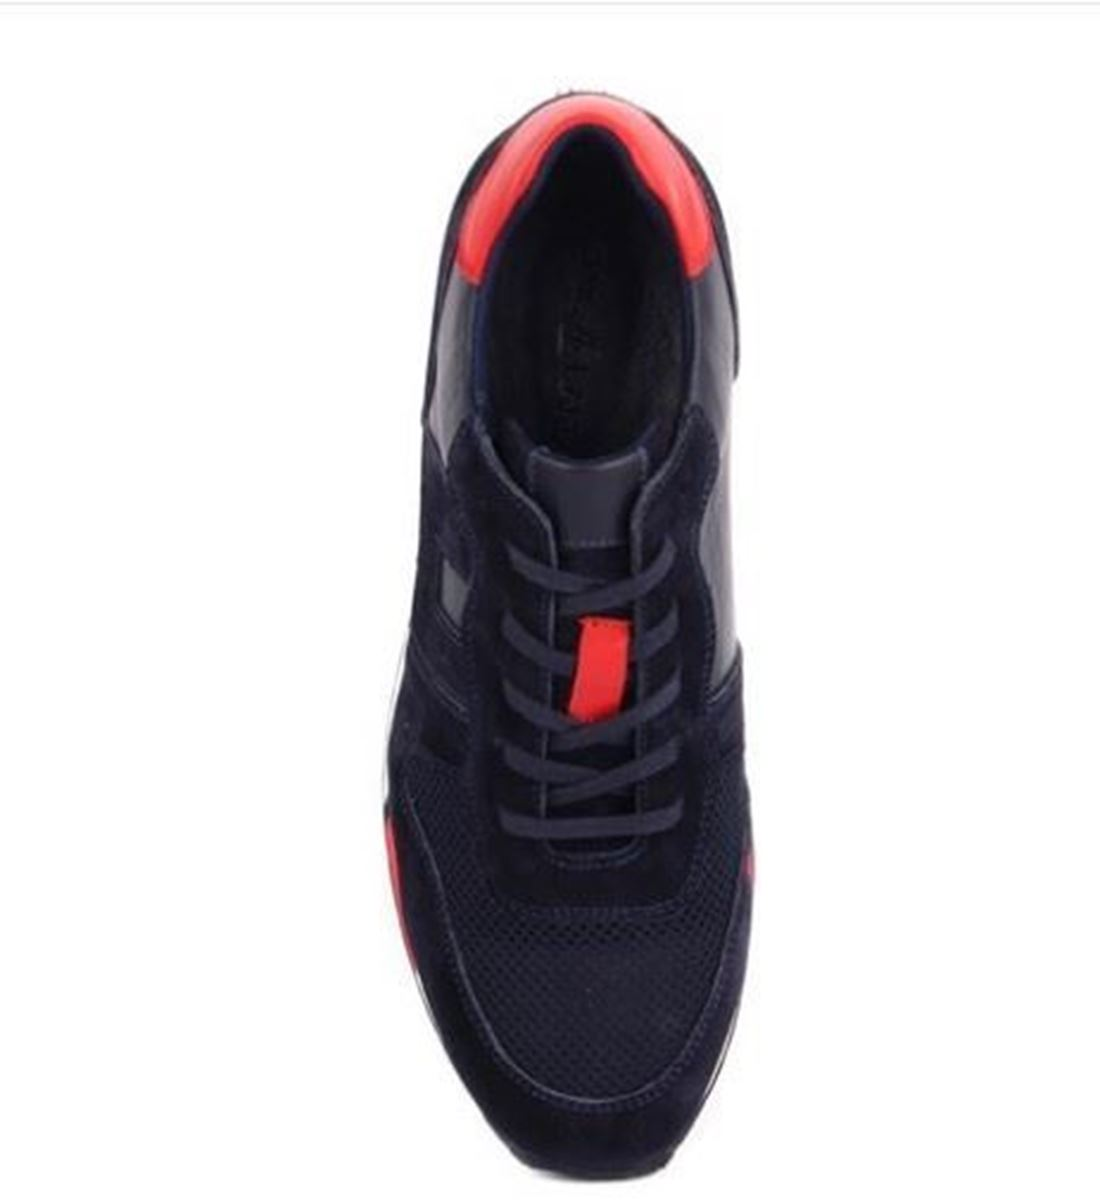 Sail Lakers - Lacivert Süet Erkek Deri Sneaker resmi